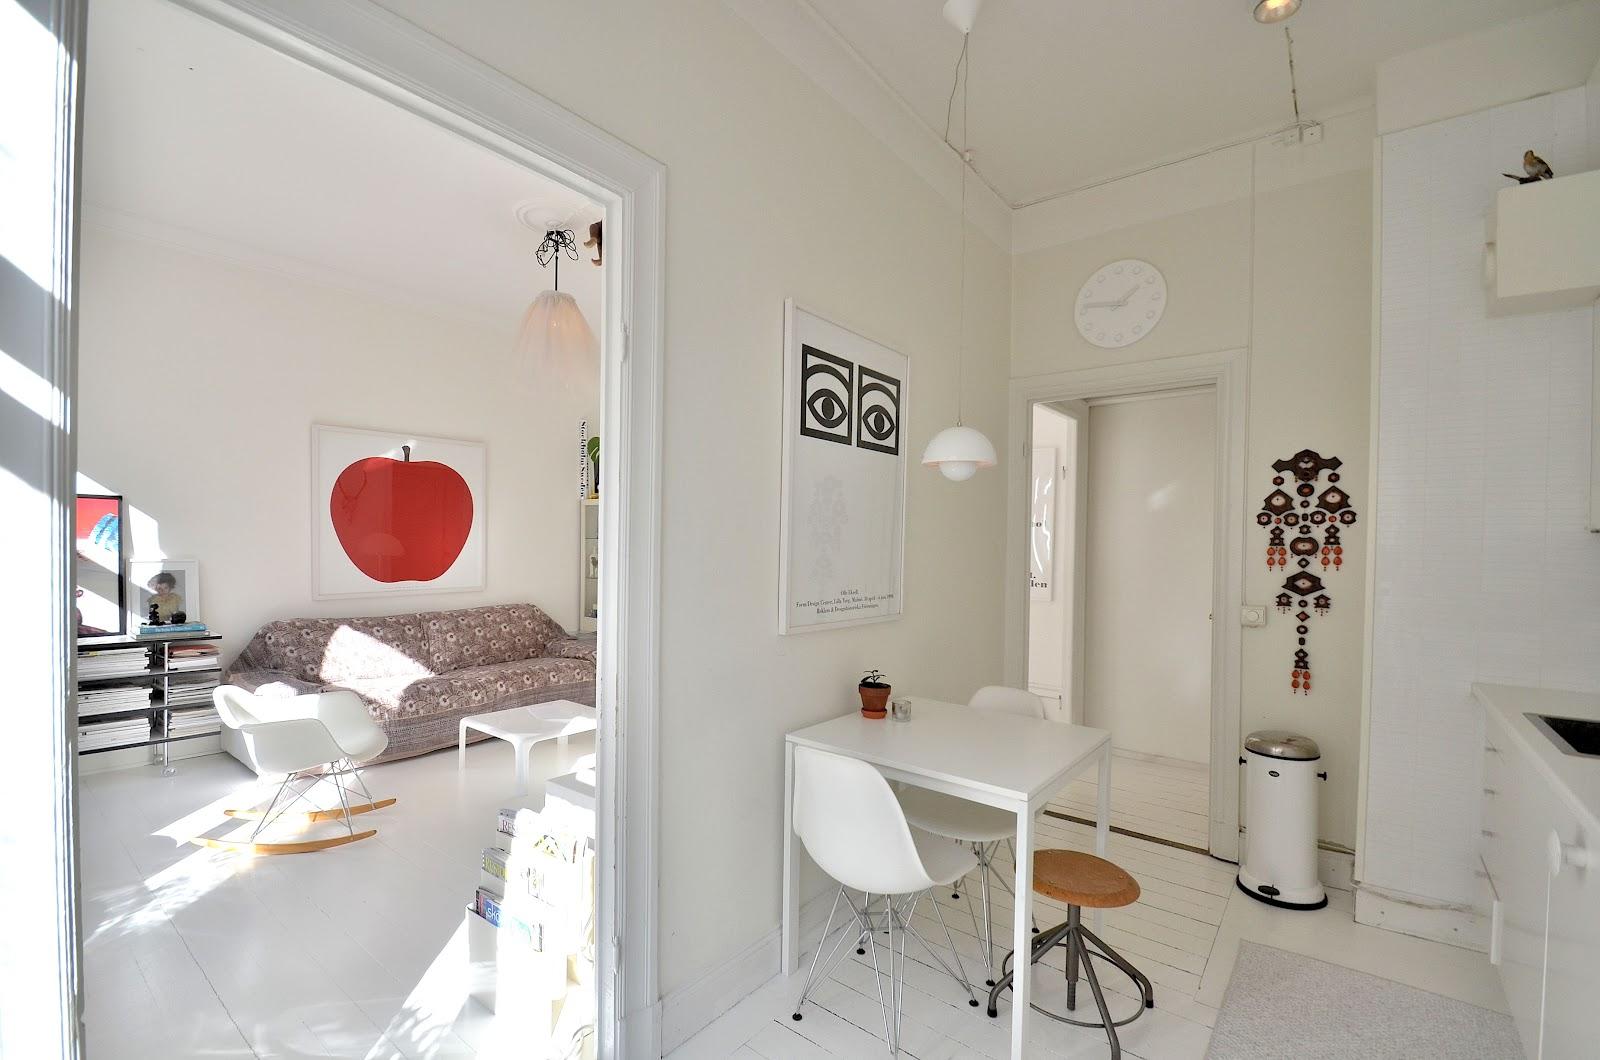 Scoop - Swedish design apt rental in Stockholm